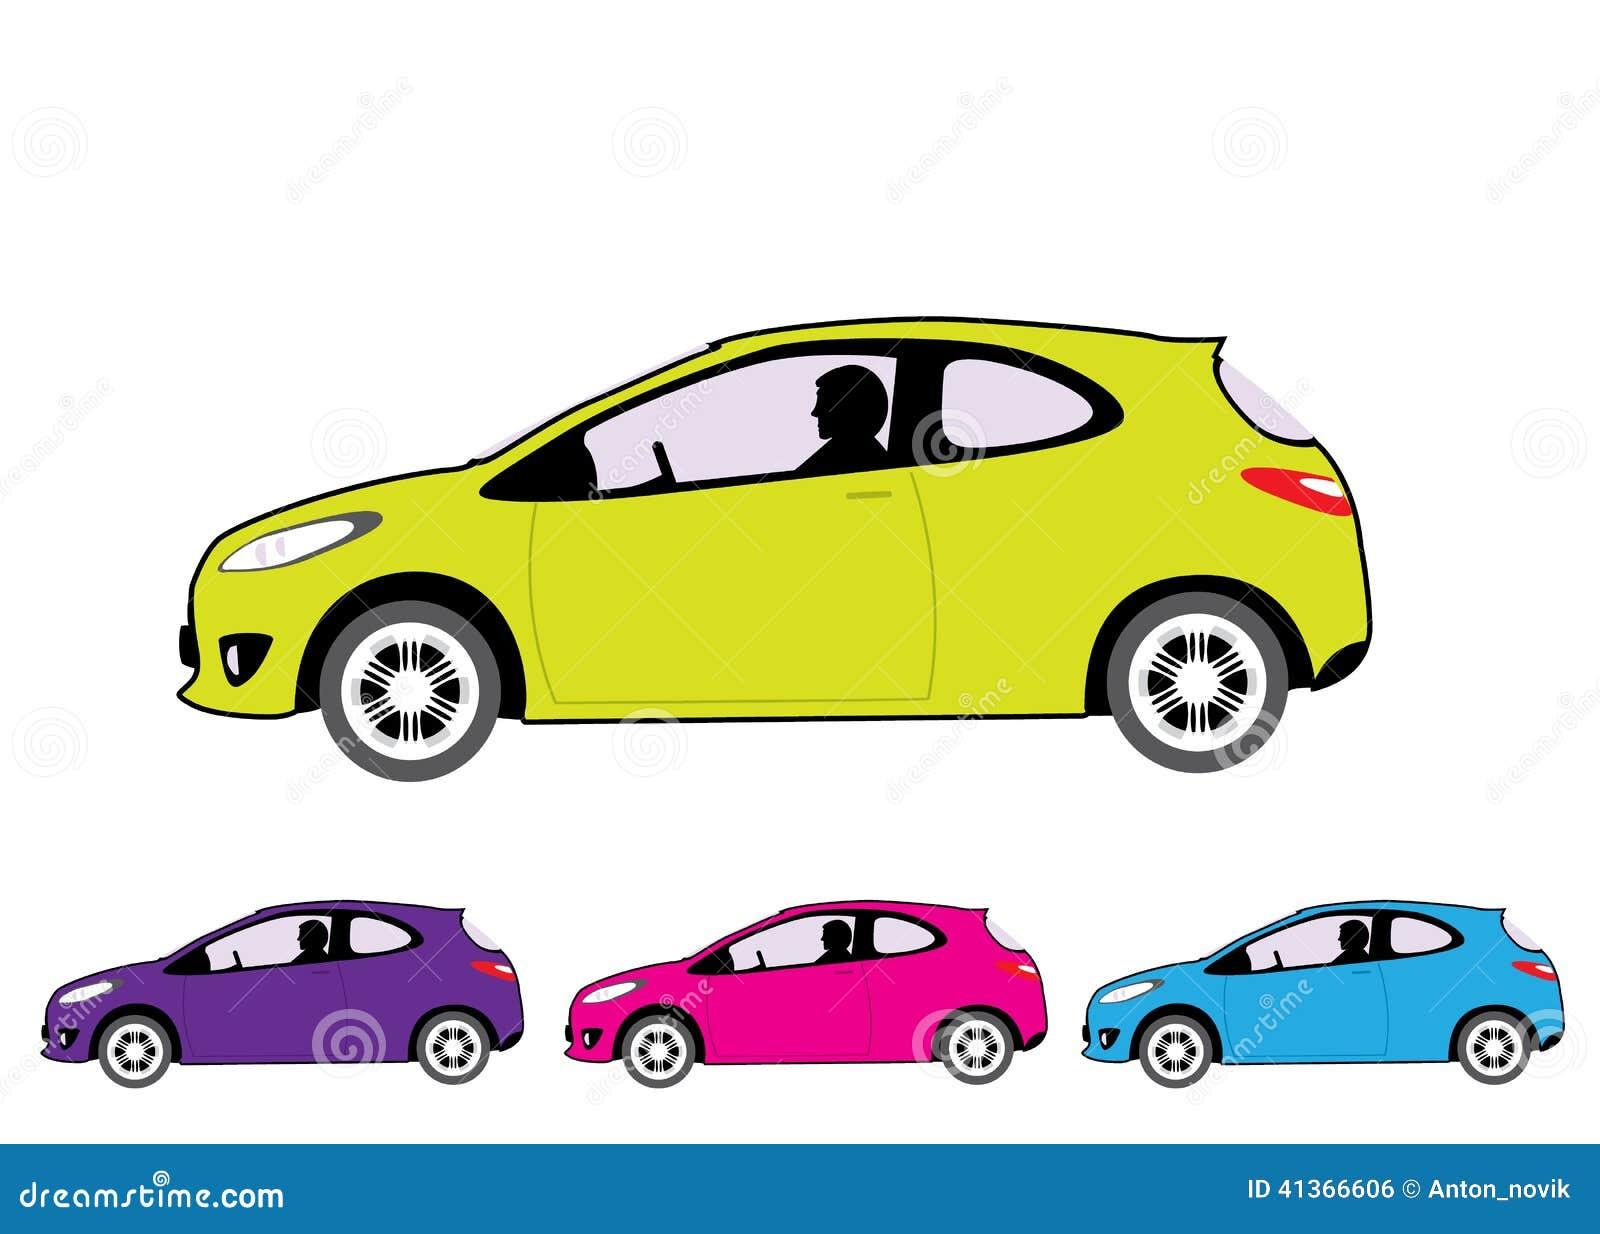 car clip art illustrations - photo #11